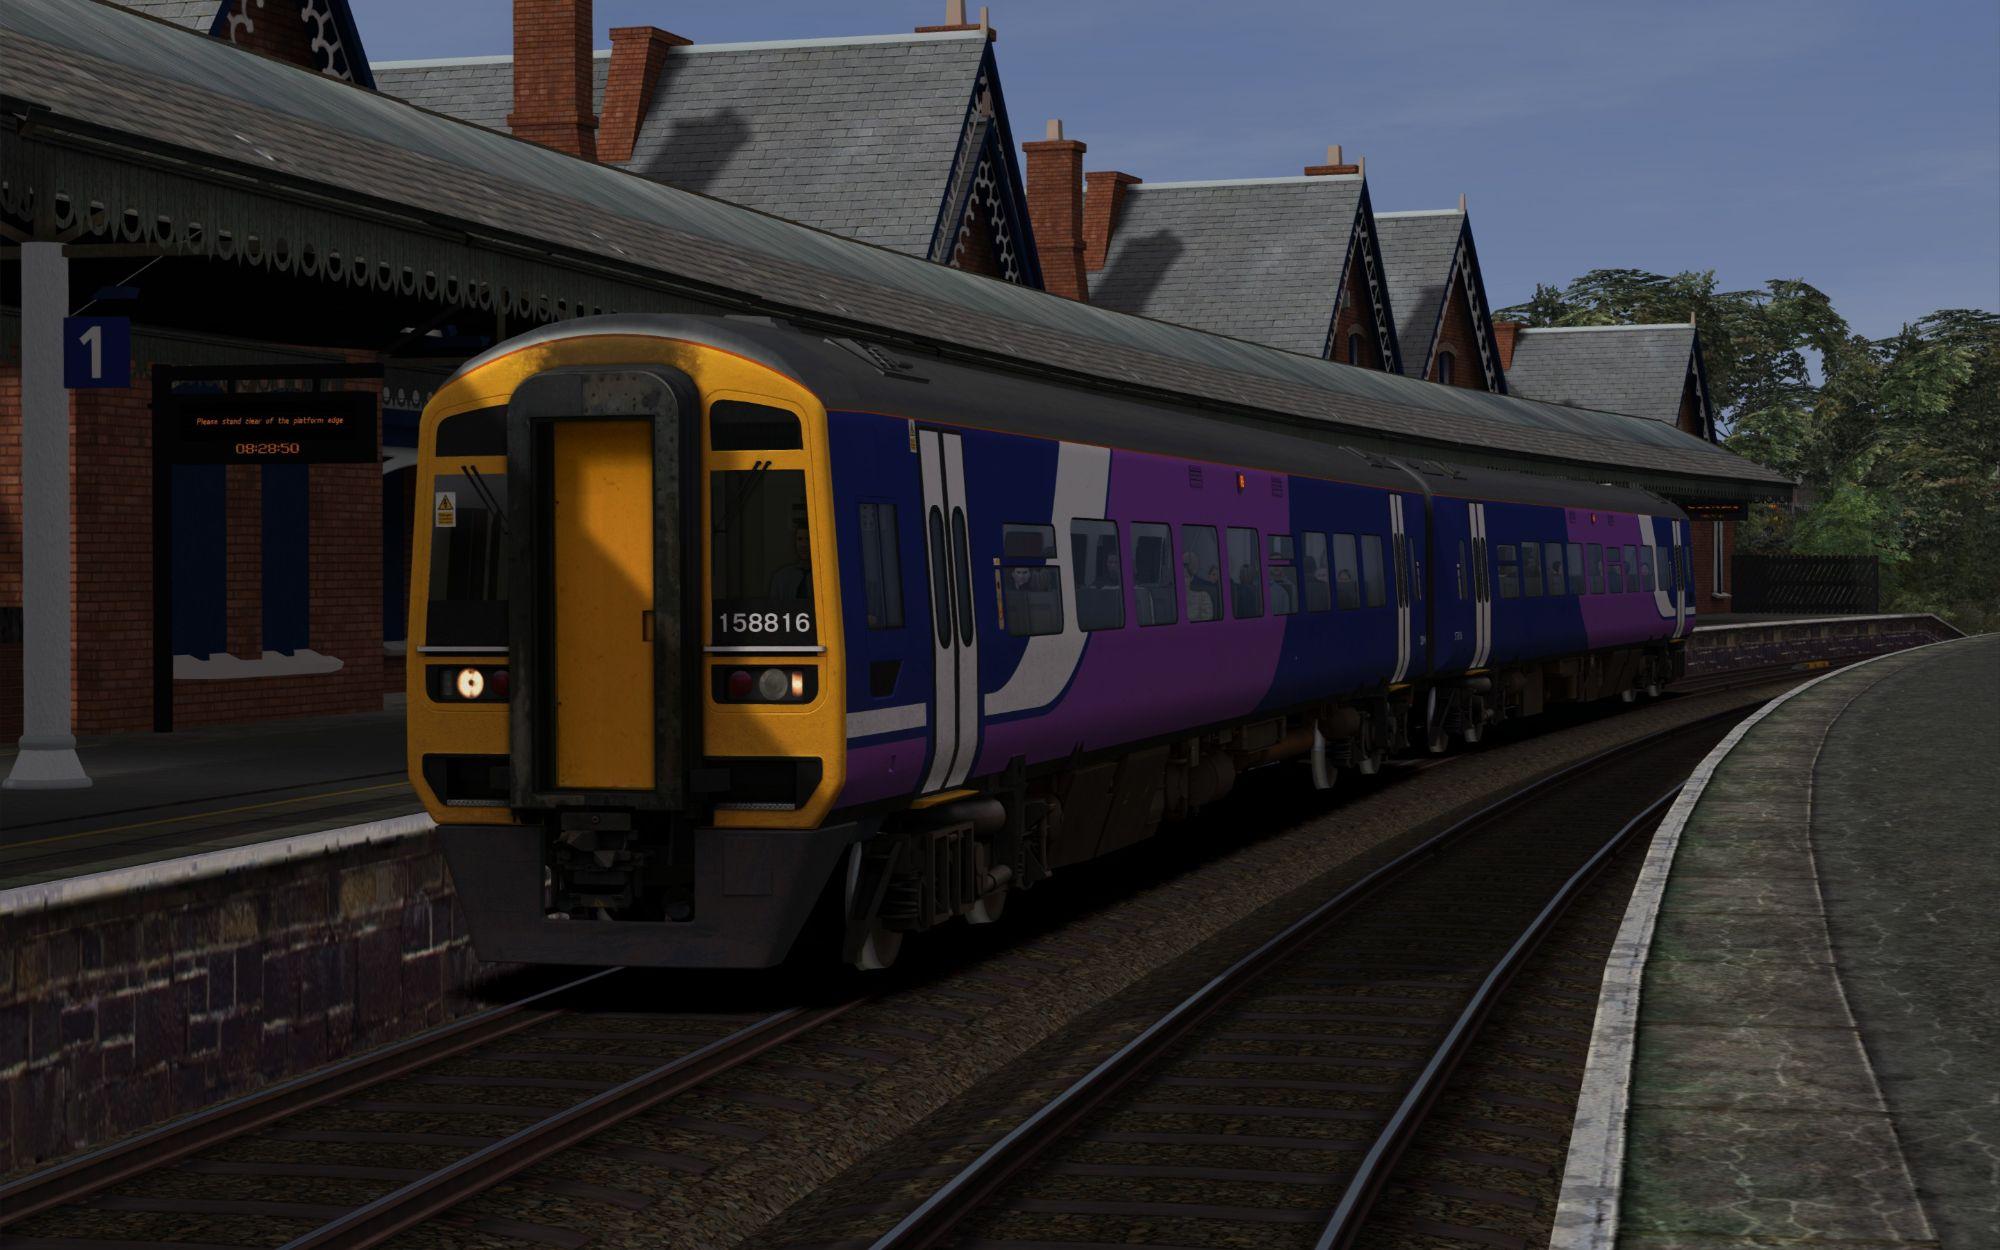 Image showing screenshot of the 2N08 - 0544 Carlisle to Nunthorpe scenario